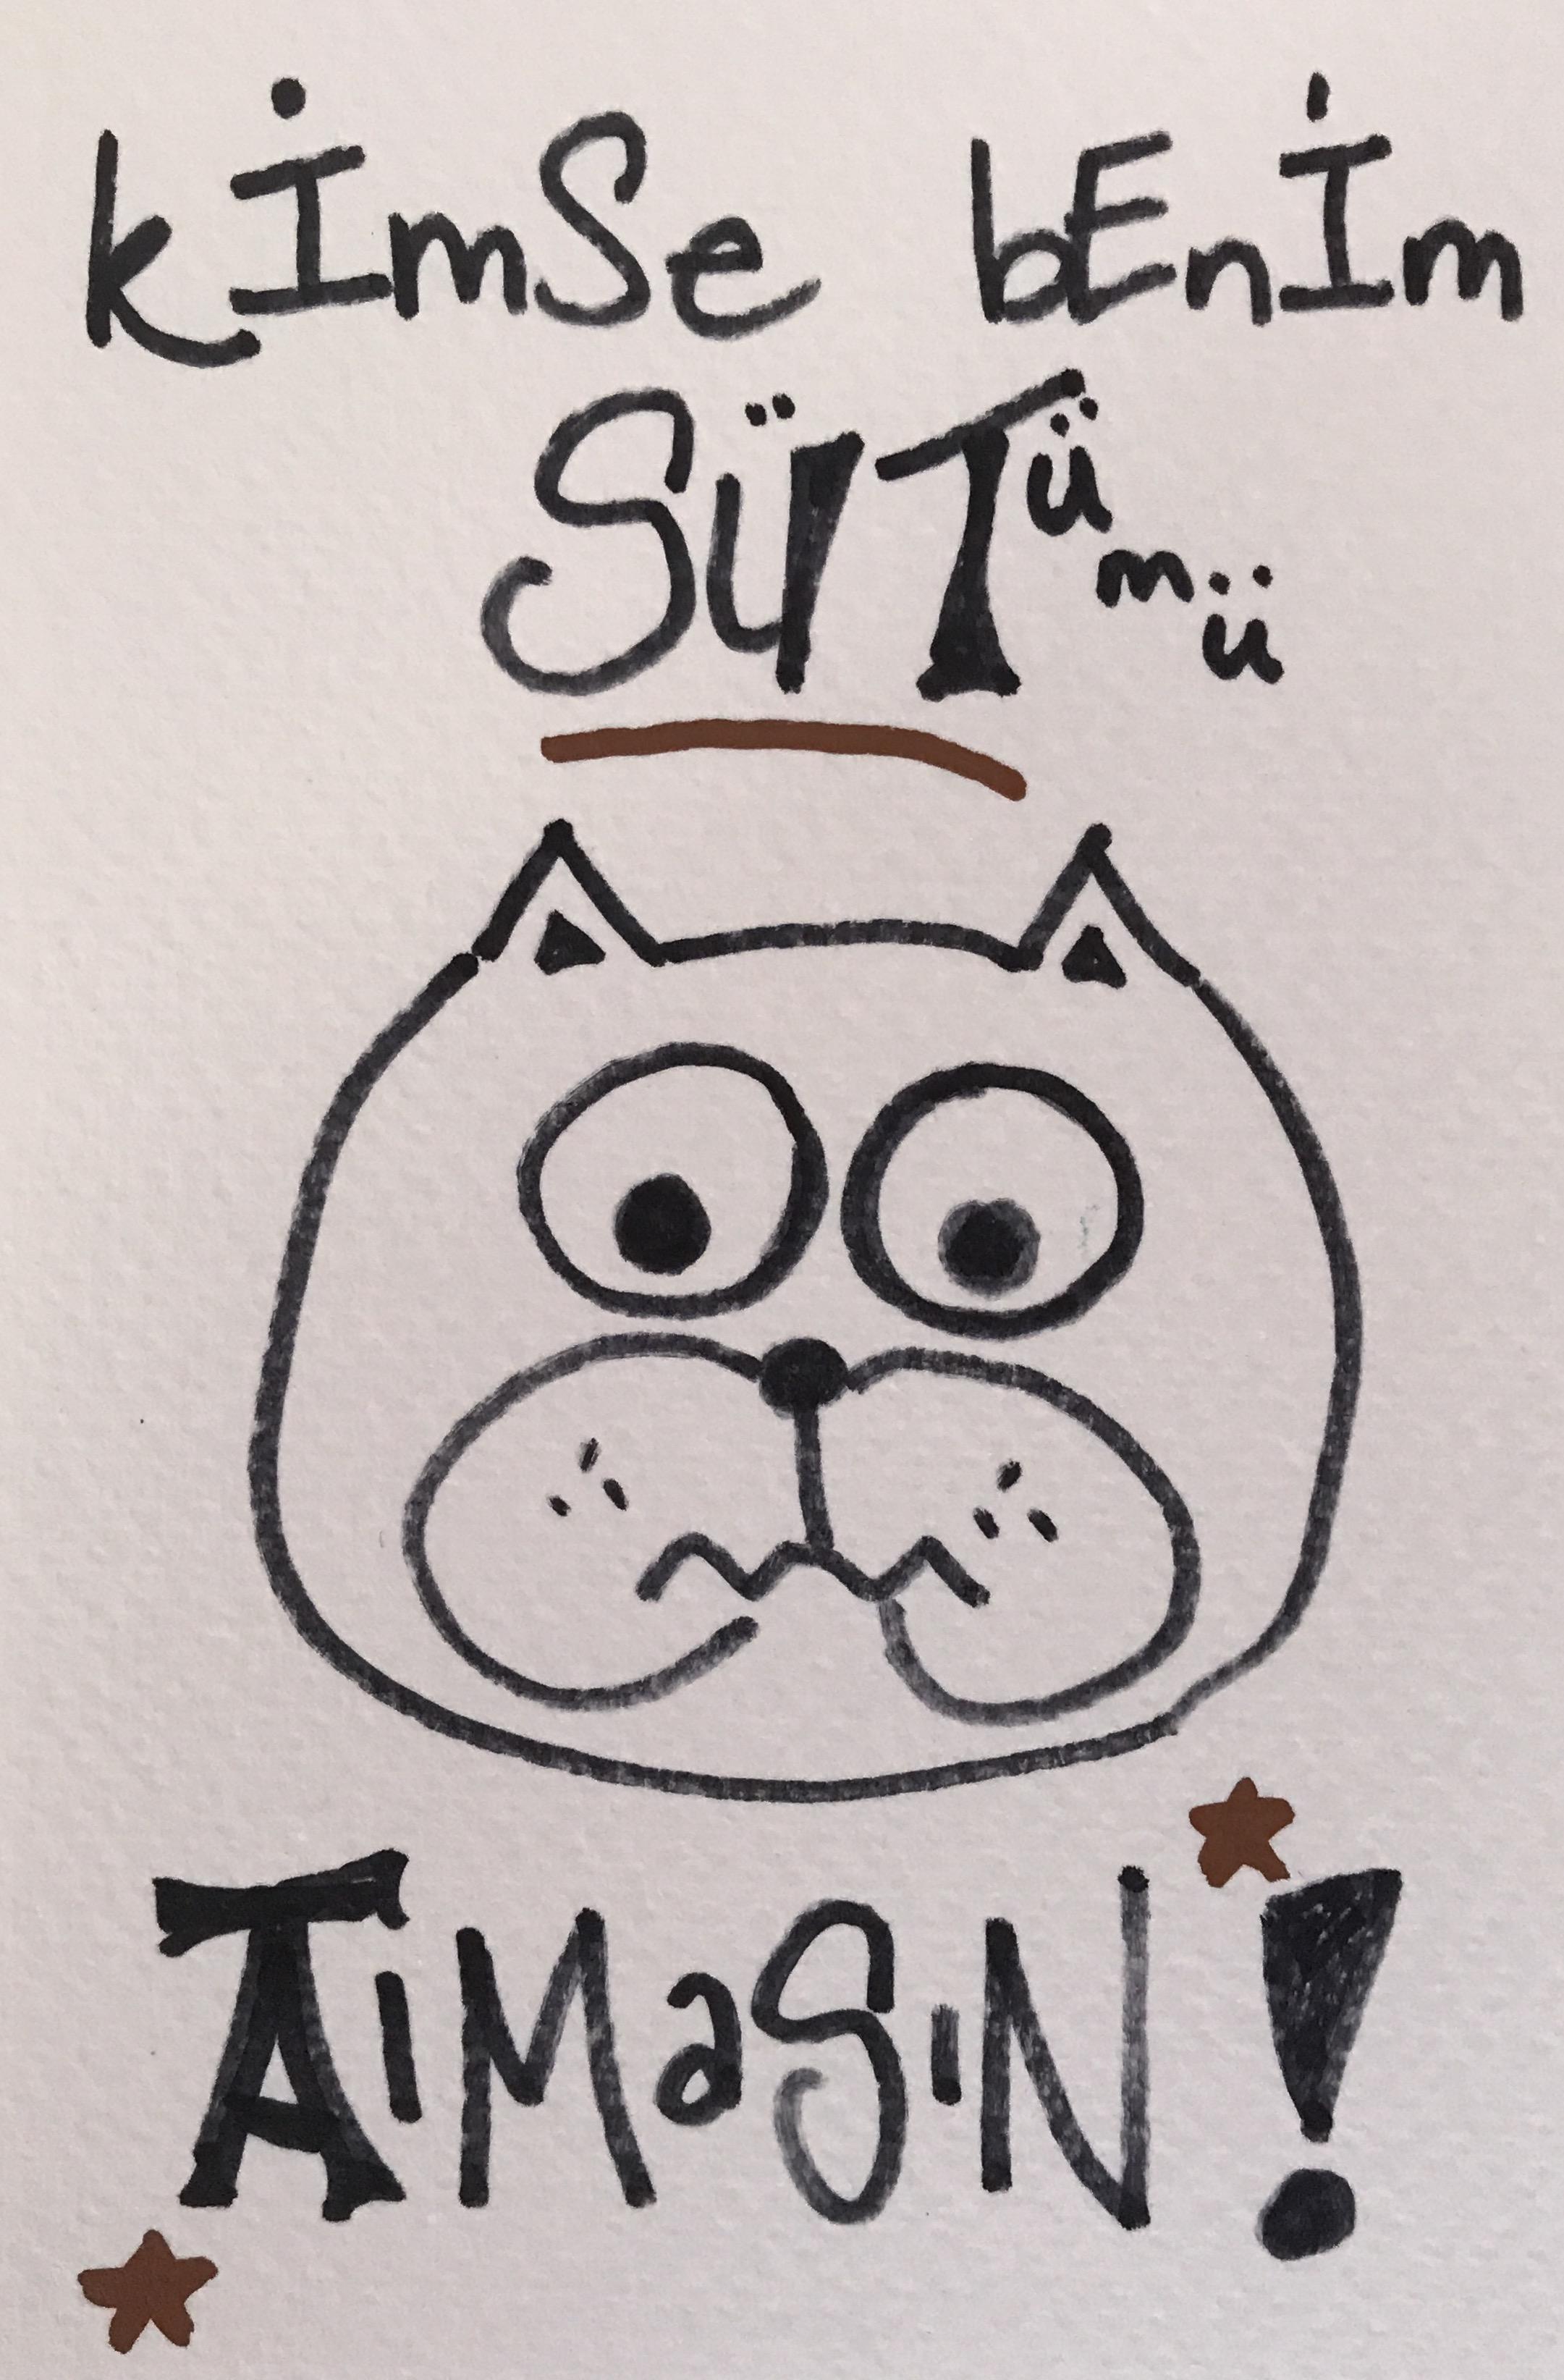 Kimse benim sütümü almasın Türkçe kedicik かわいい ドイツ語 仔猫 描く コミックス comics kitten kätzchen drawing ink